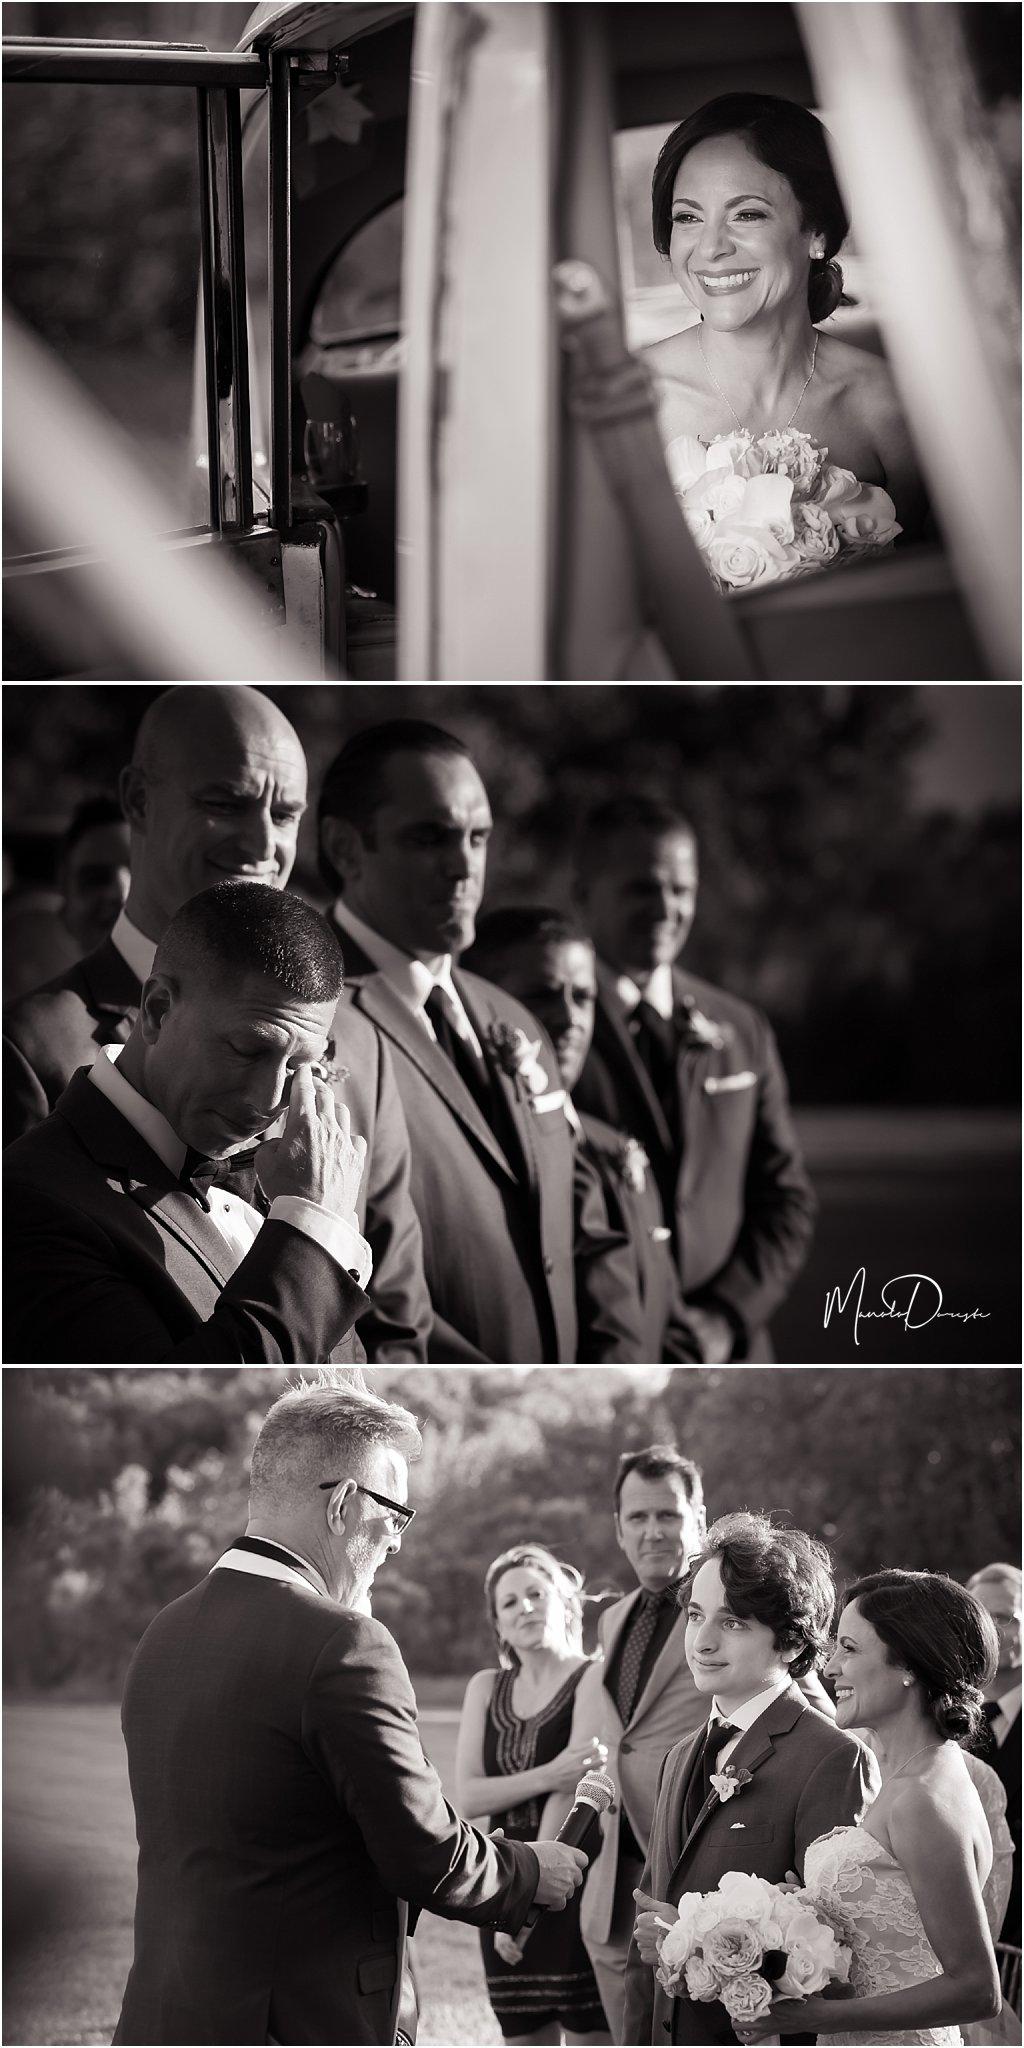 00839_ManoloDoreste_InFocusStudios_Wedding_Family_Photography_Miami_MiamiPhotographer.jpg